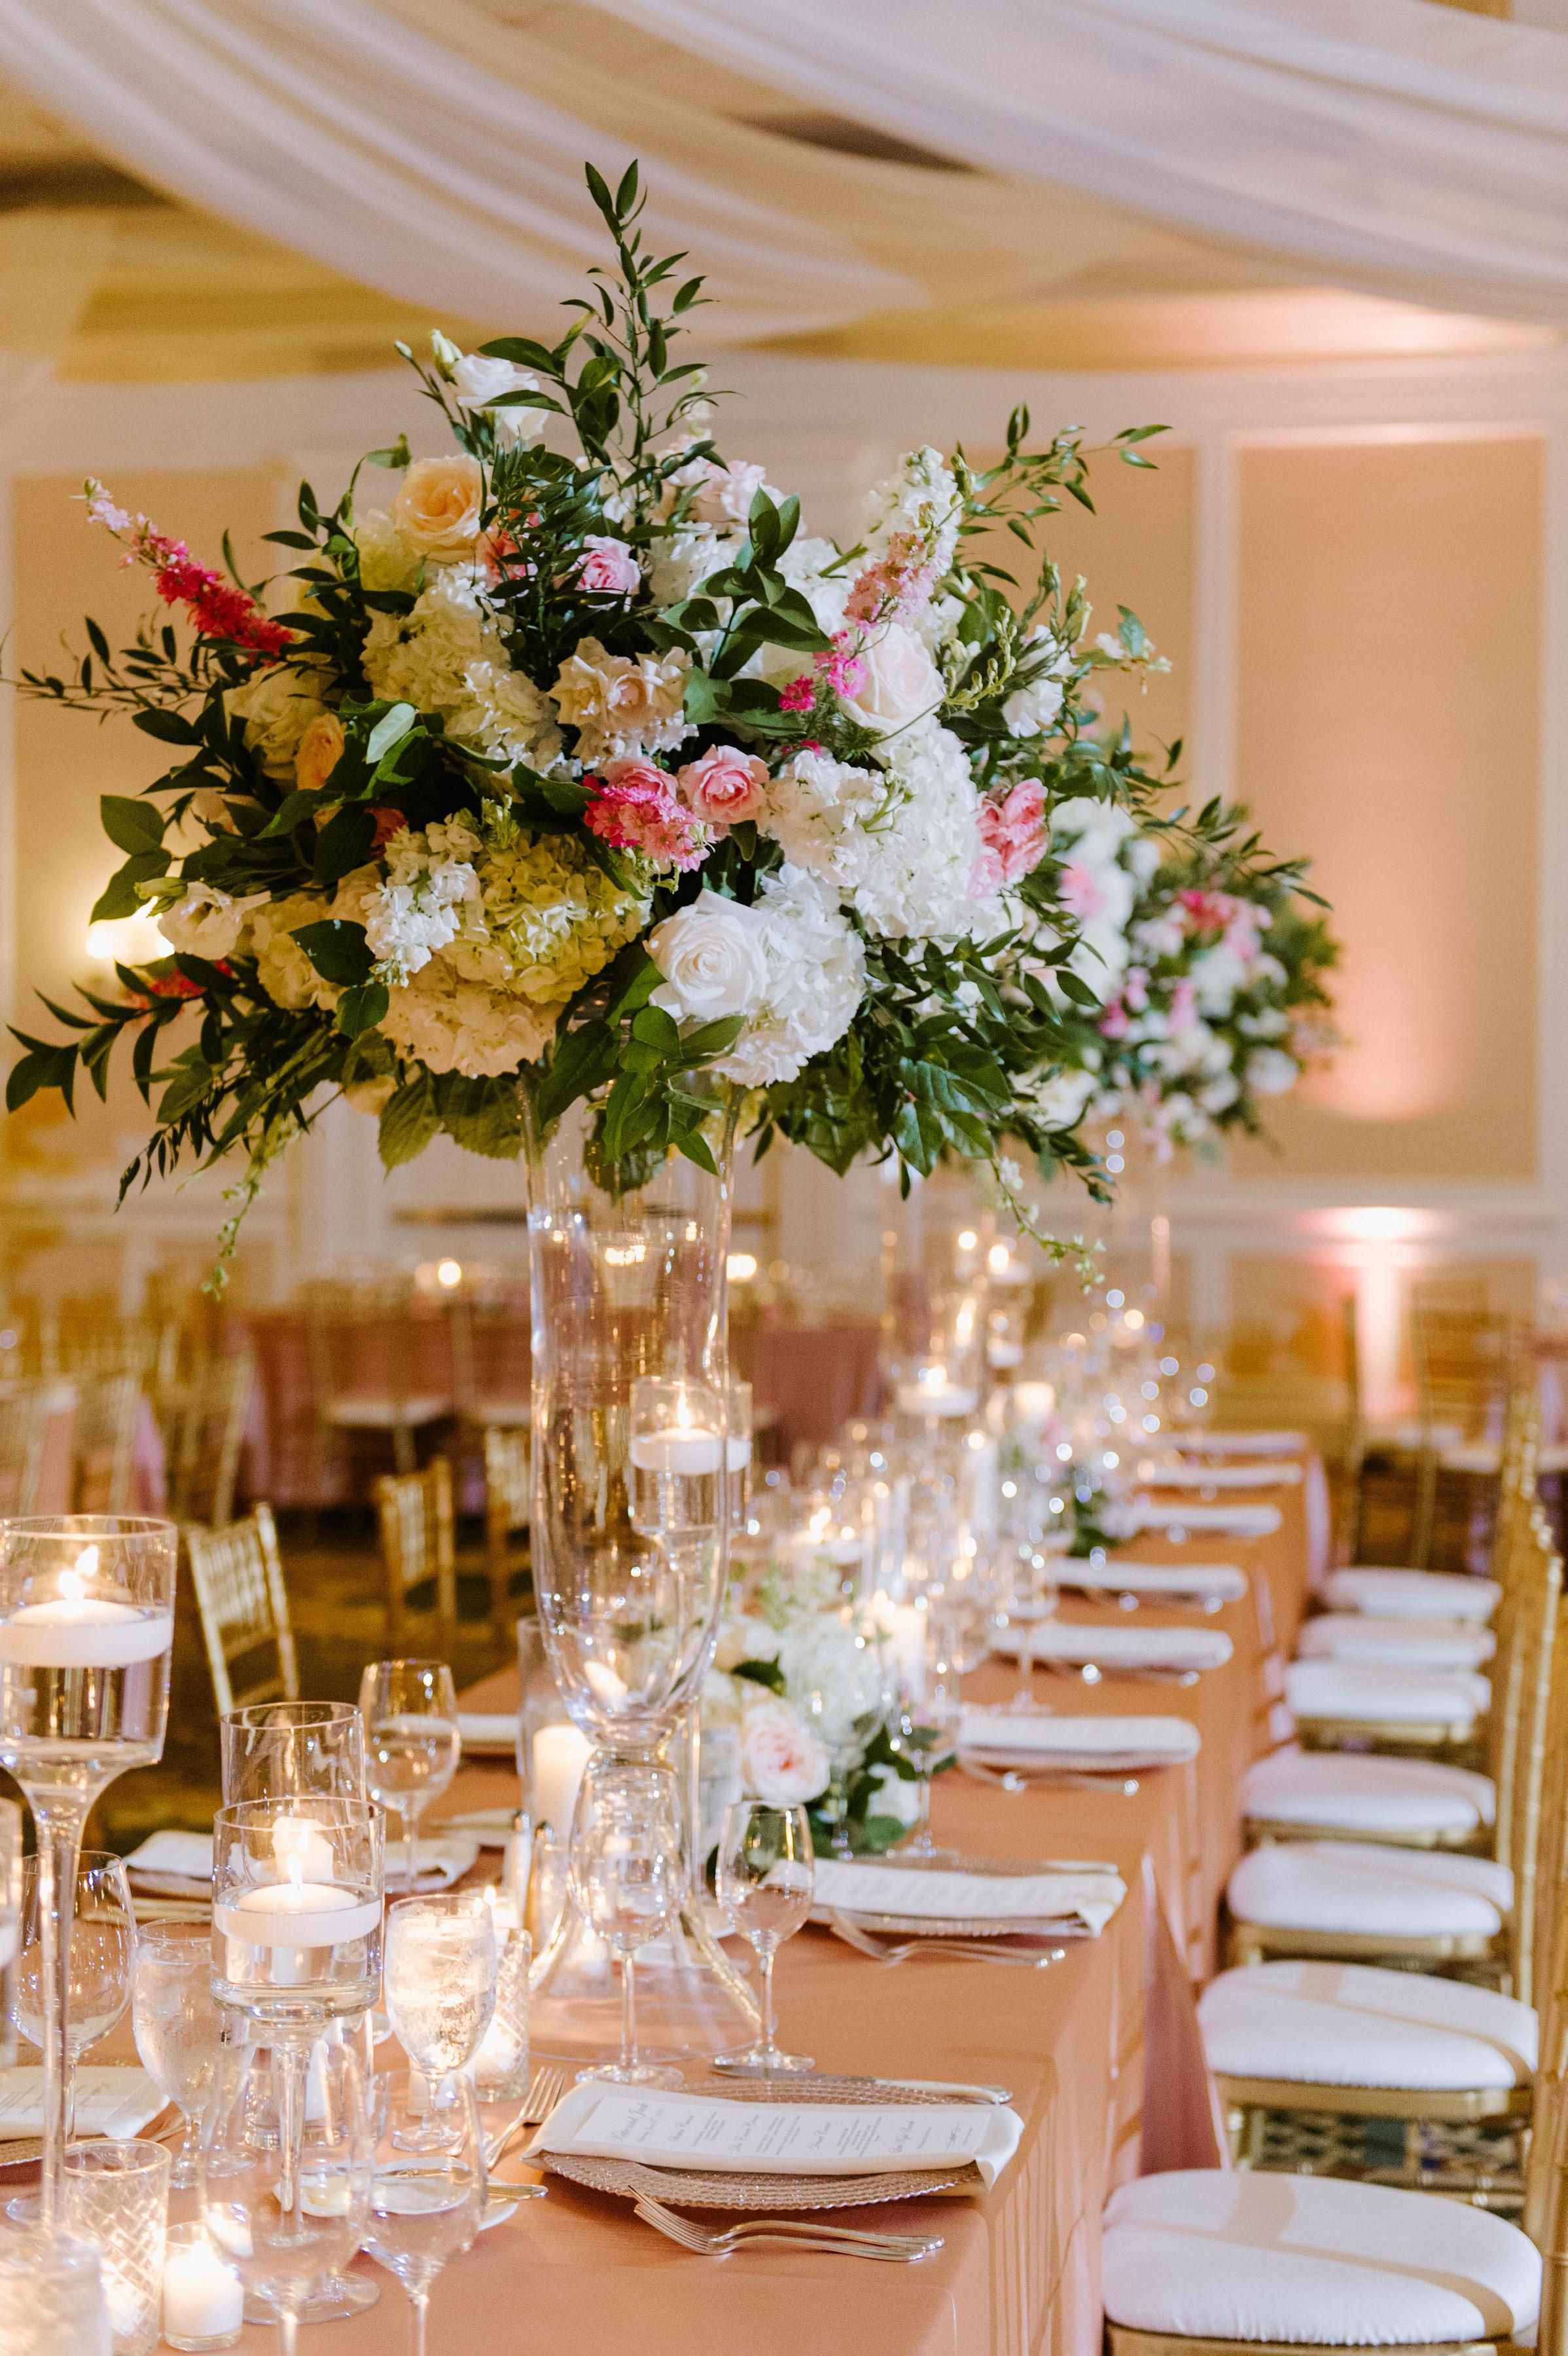 McElravey_Wedding_CarolineLimaPhotography_2018_272.jpg